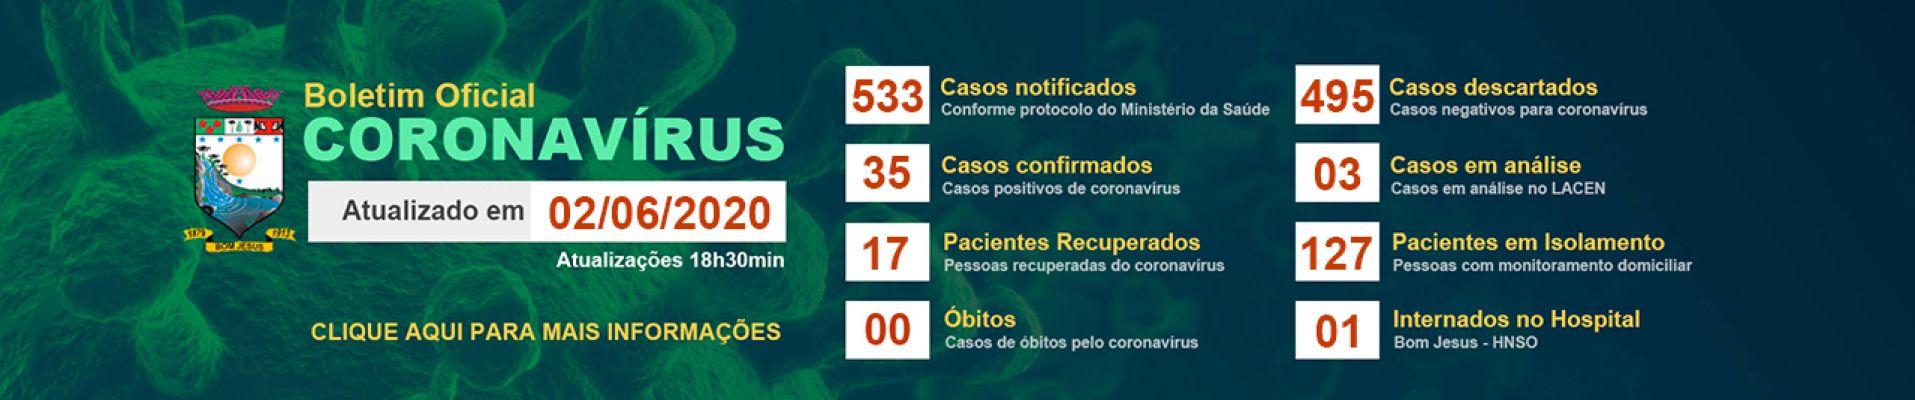 Banner 3 - Boletim Informativo 02 de junho